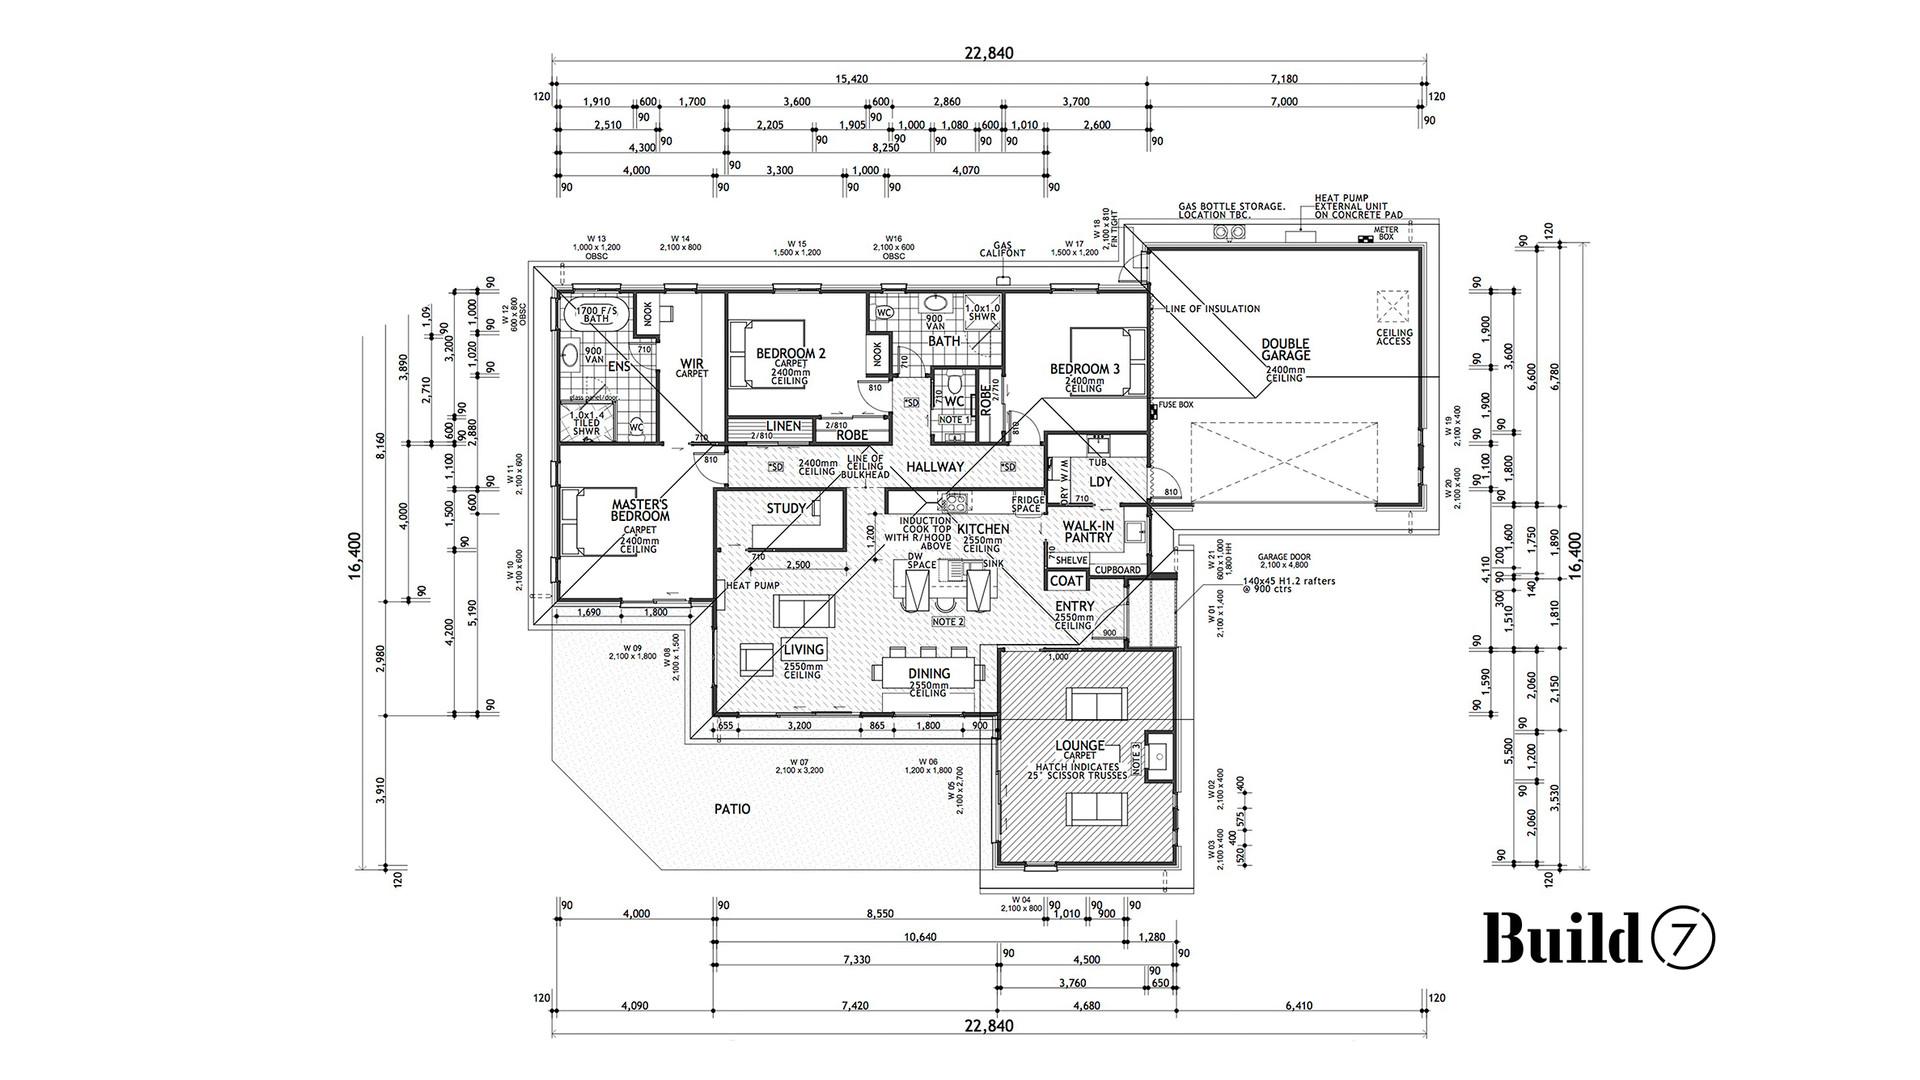 Te Whariki floor plan